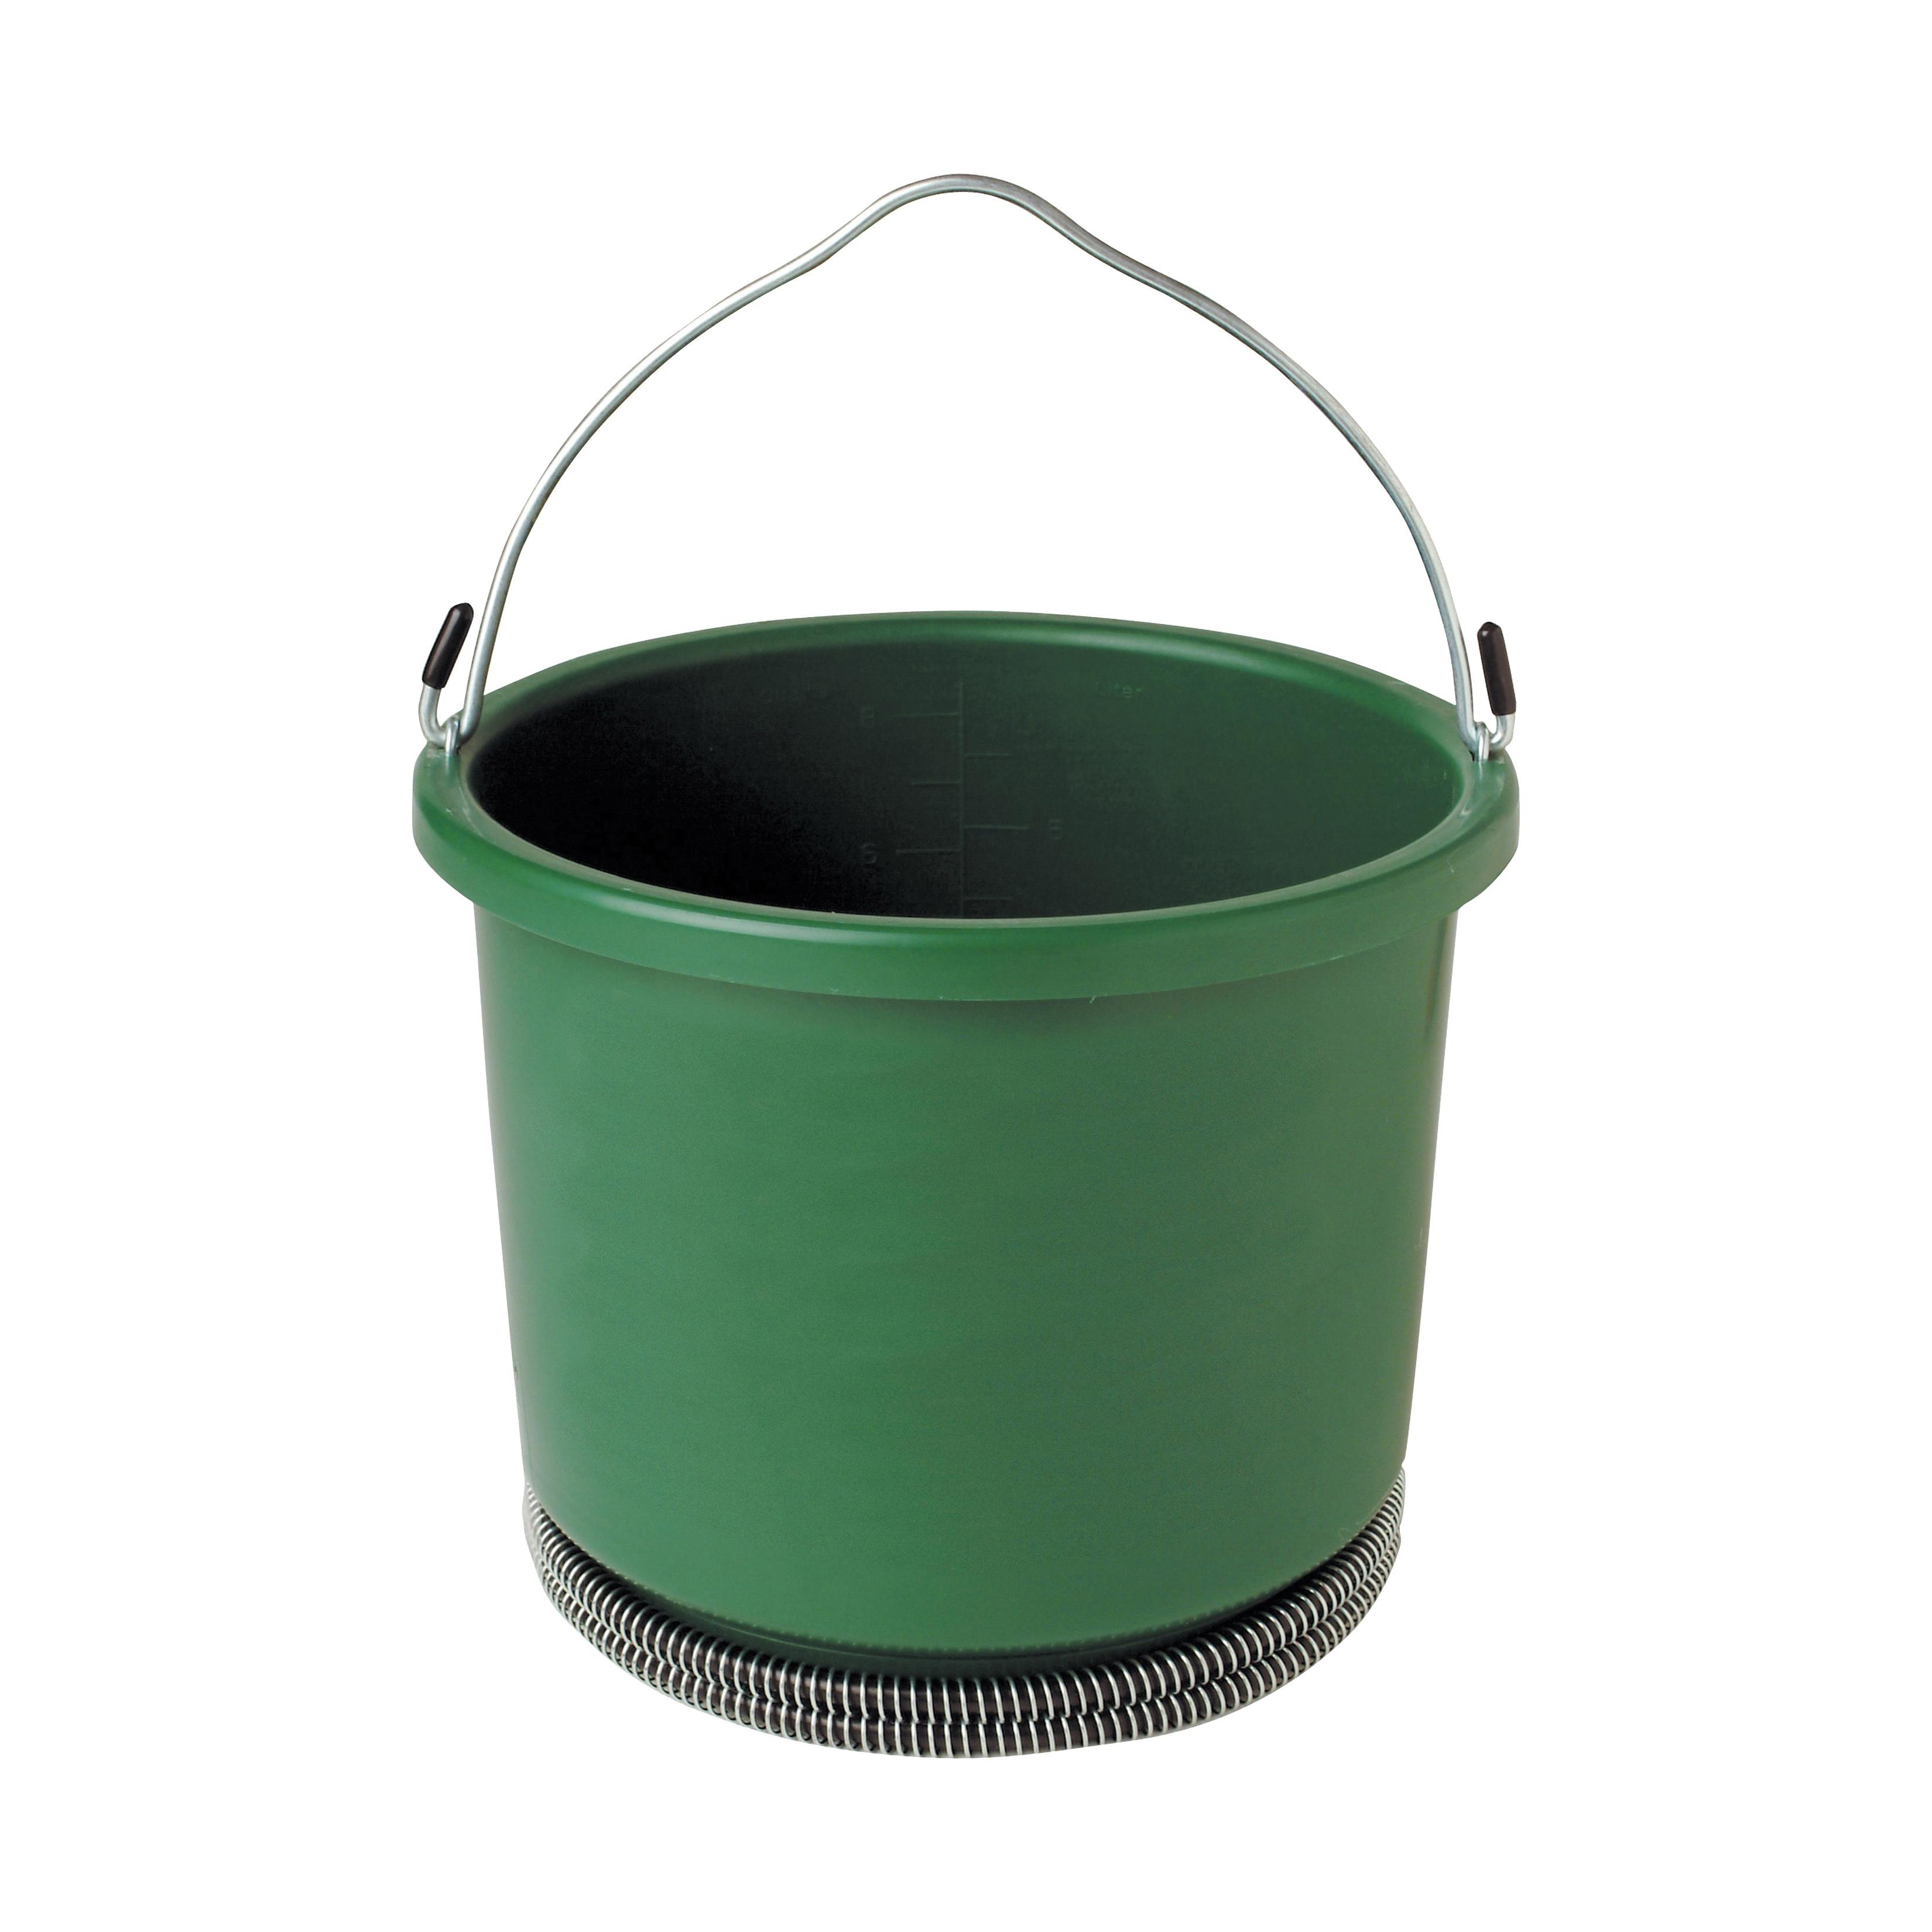 Picture of FARM INNOVATORS HB-60 Heated Bucket, Plastic, Green